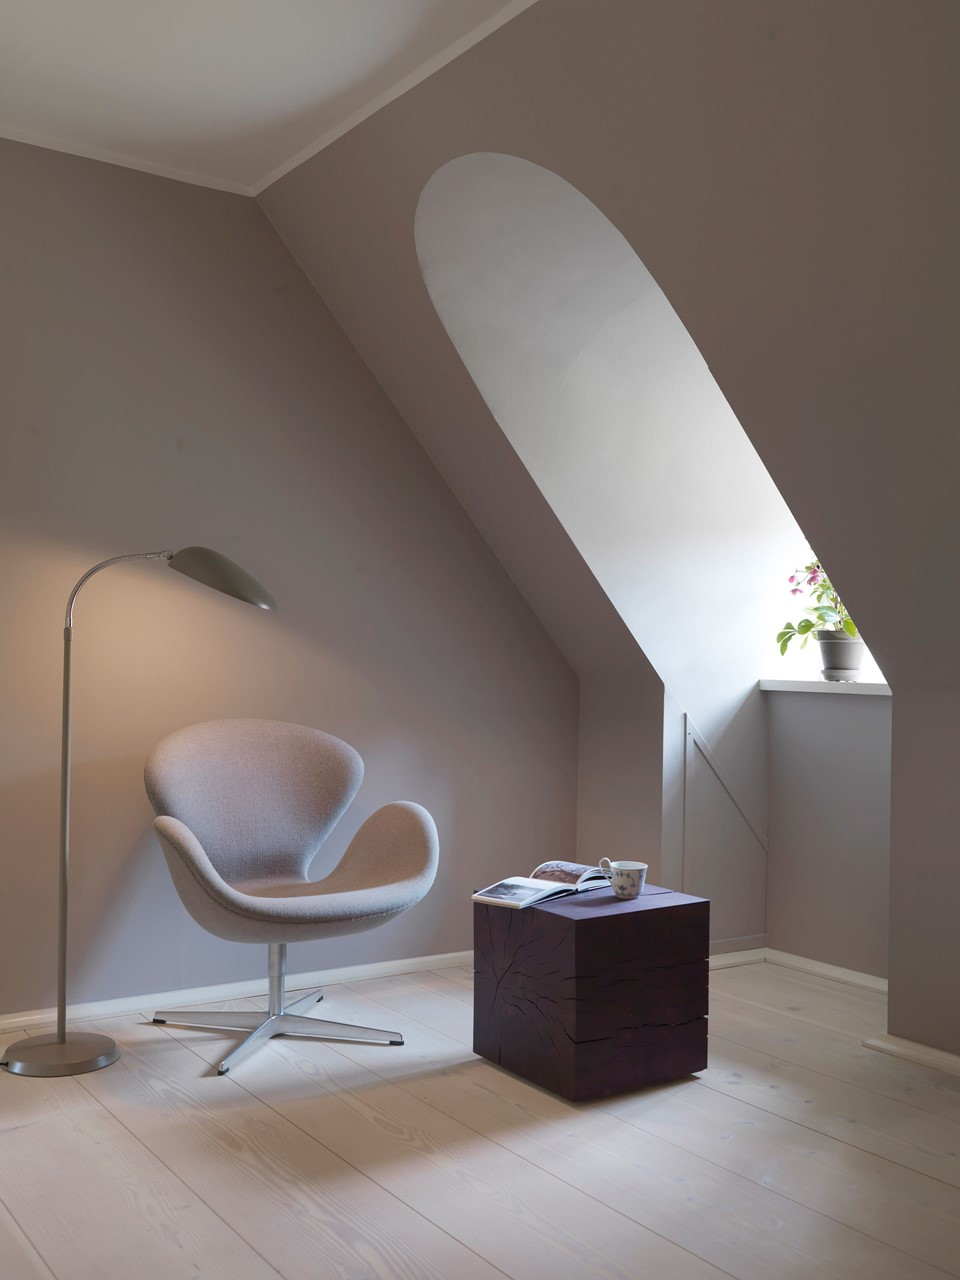 douglas fir floor lye white soap underfloor heating dining room dinesen country home.jpg